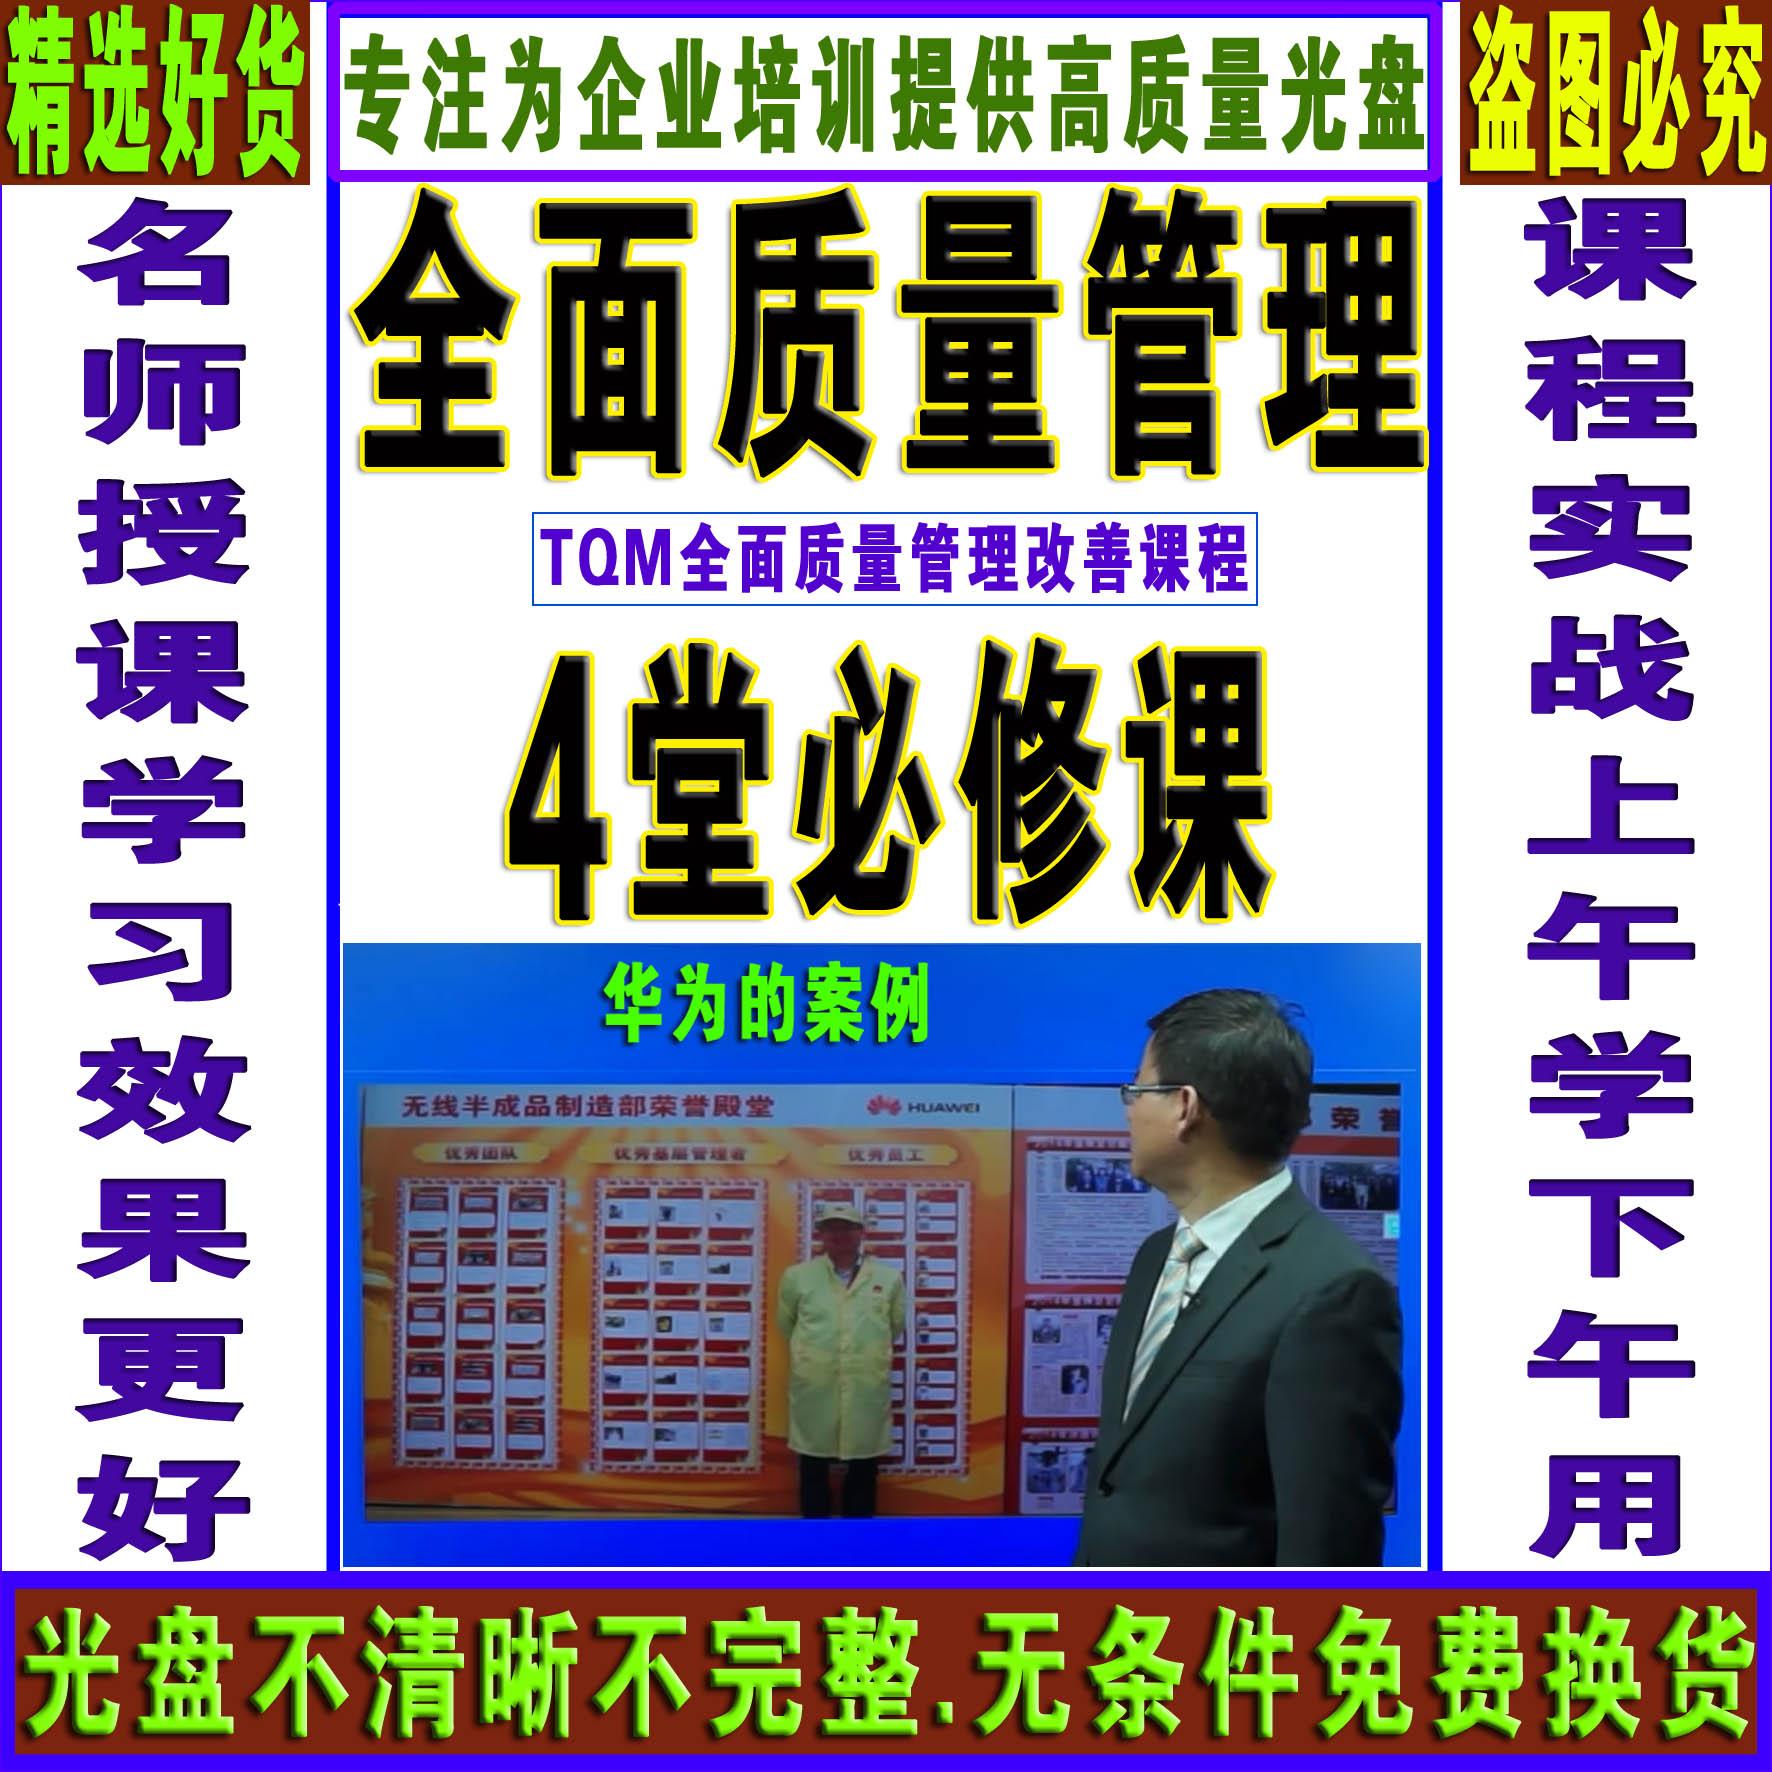 TQM全面质量管理生产品质管理培训讲座视频教程DVD光盘送QC手法